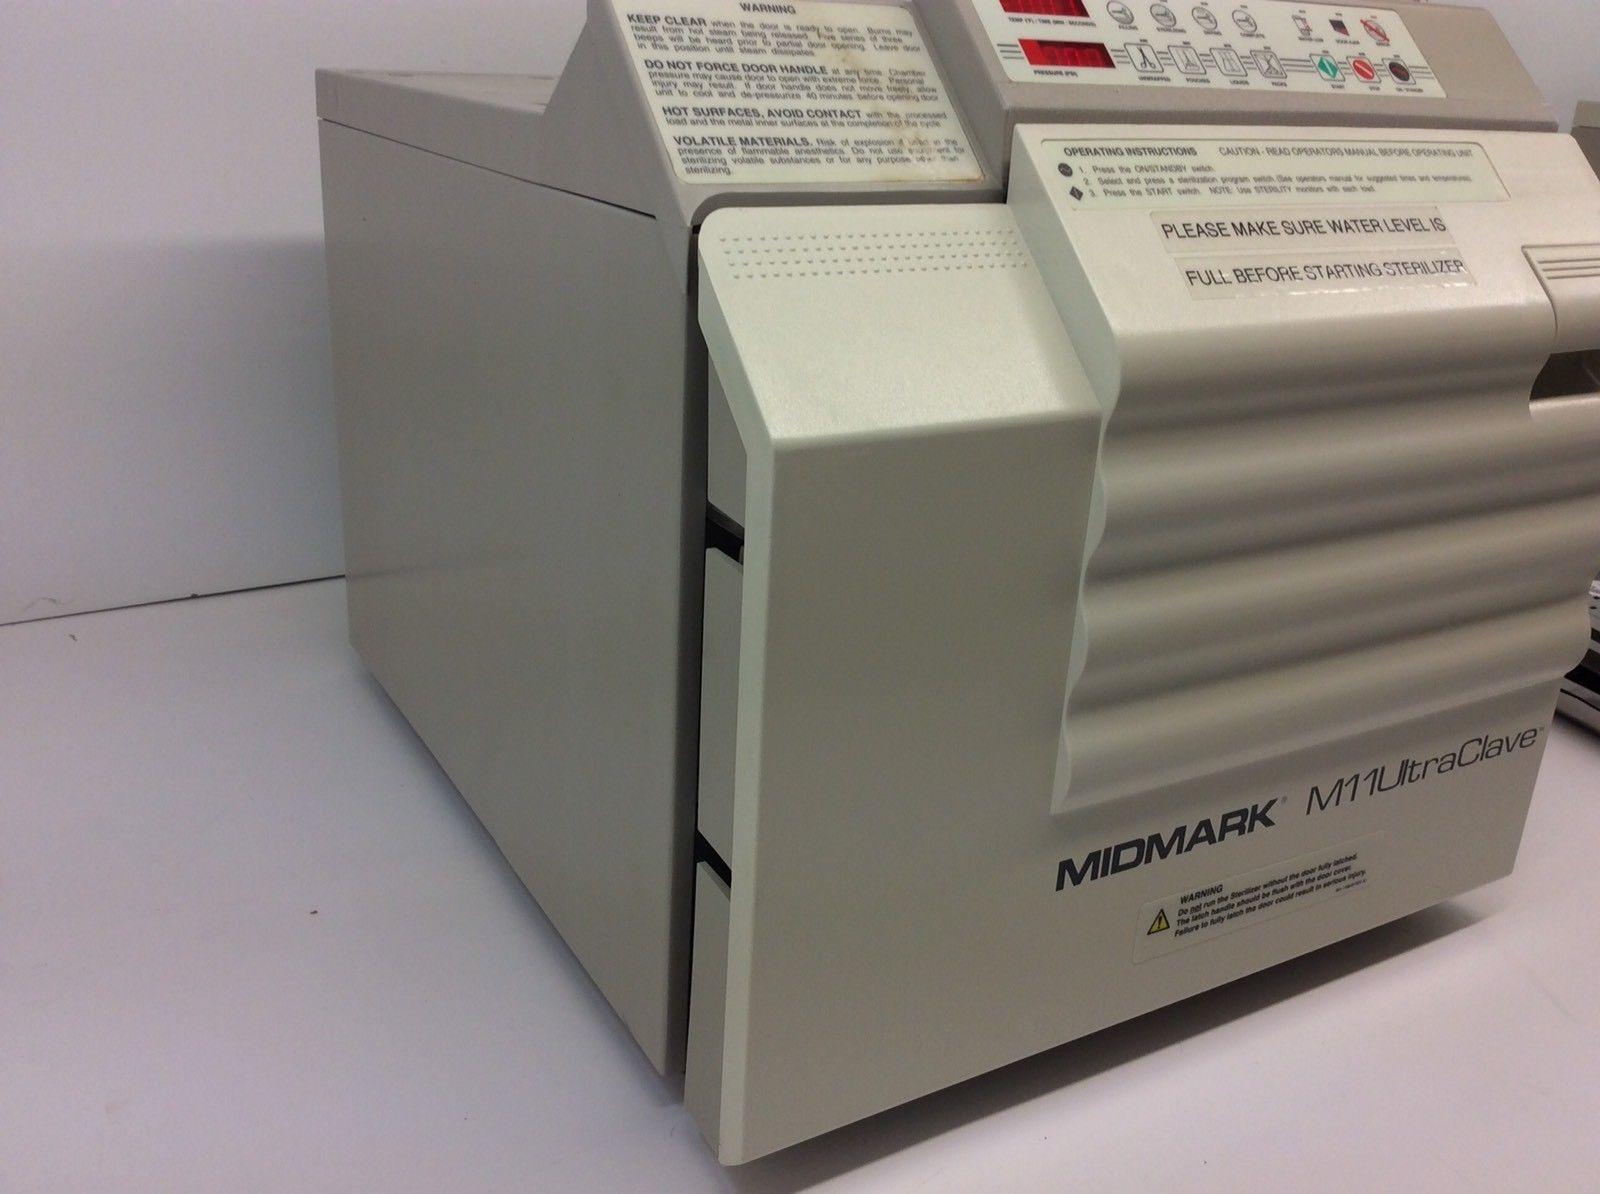 Refurbished Midmark M11 Ultraclave Old Style 1 Yr Wrnty Statim Wiring Diagram Main 3